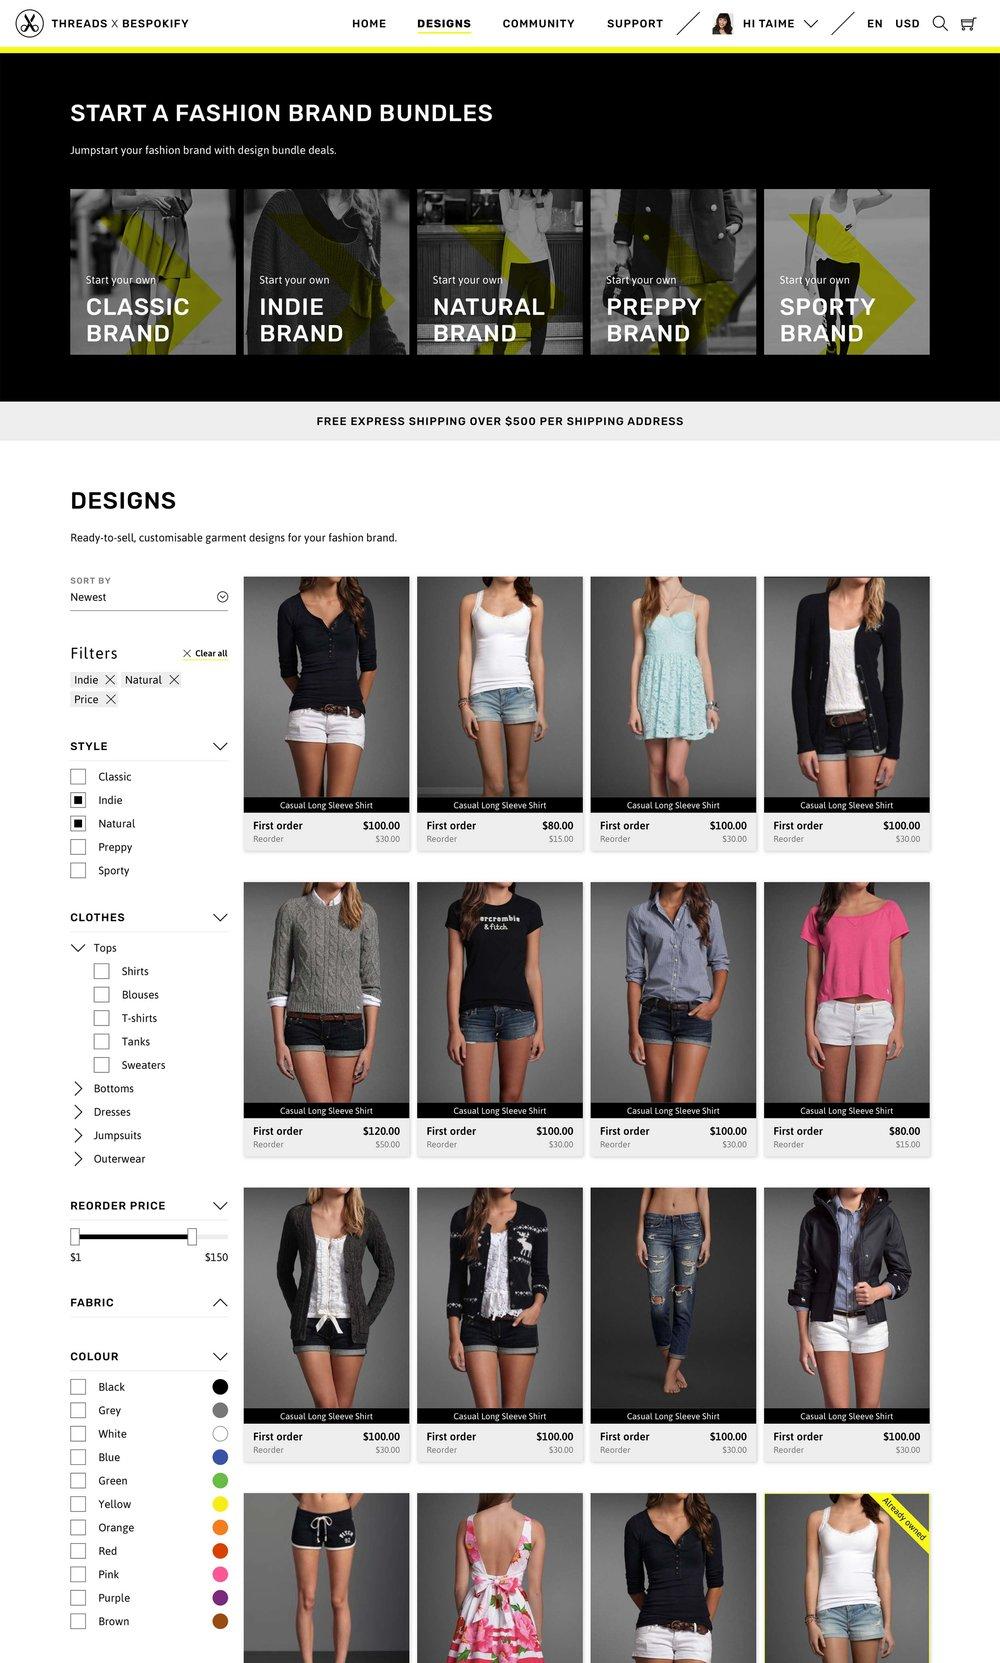 02-Designs.jpg